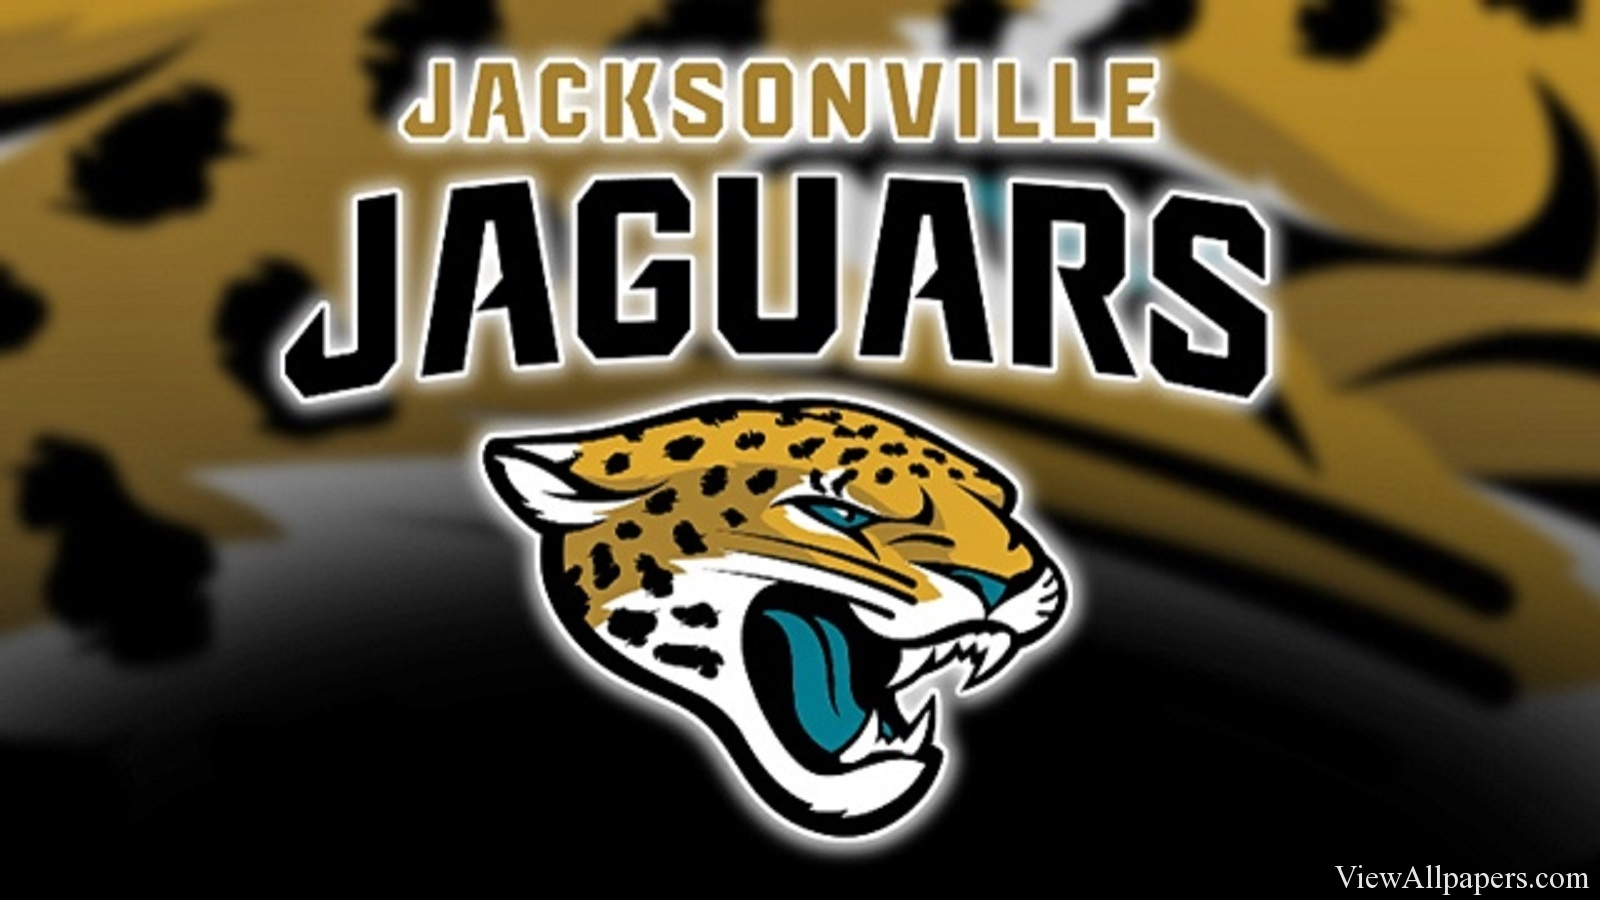 Wallpaper download jaguar - Jacksonville Jaguars Logo Hd Resolution Wallpaper Free Download